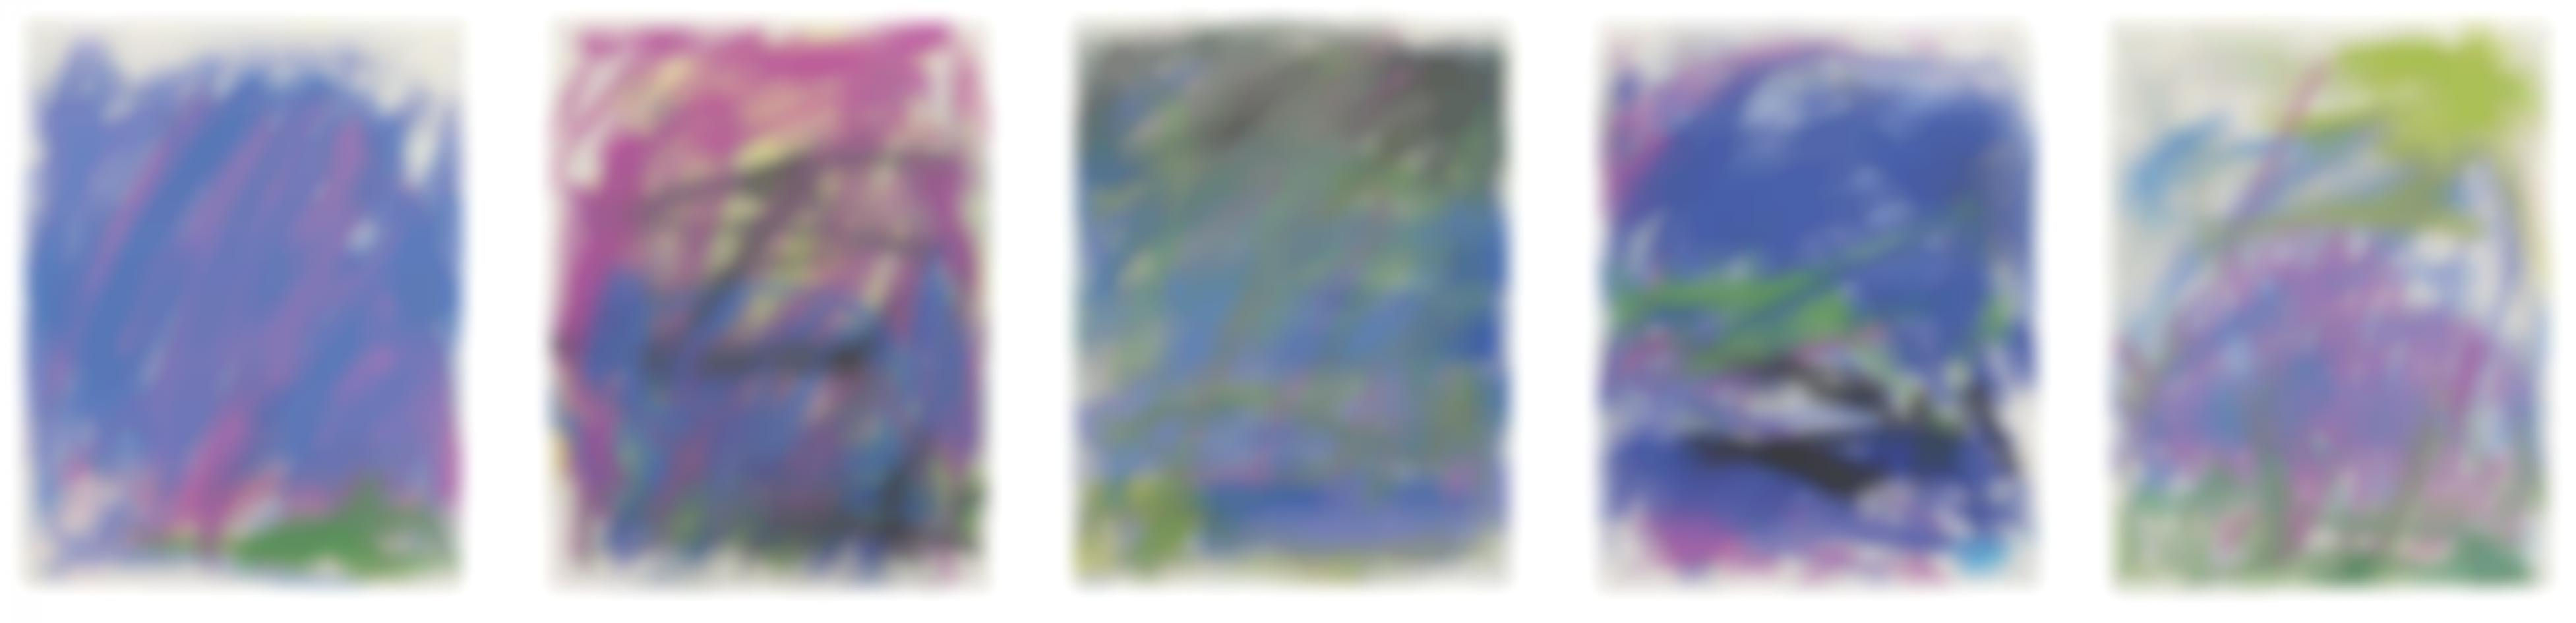 Joan Mitchell-Untitled; Untitled; Untitled; Untitled; Untitled-1983